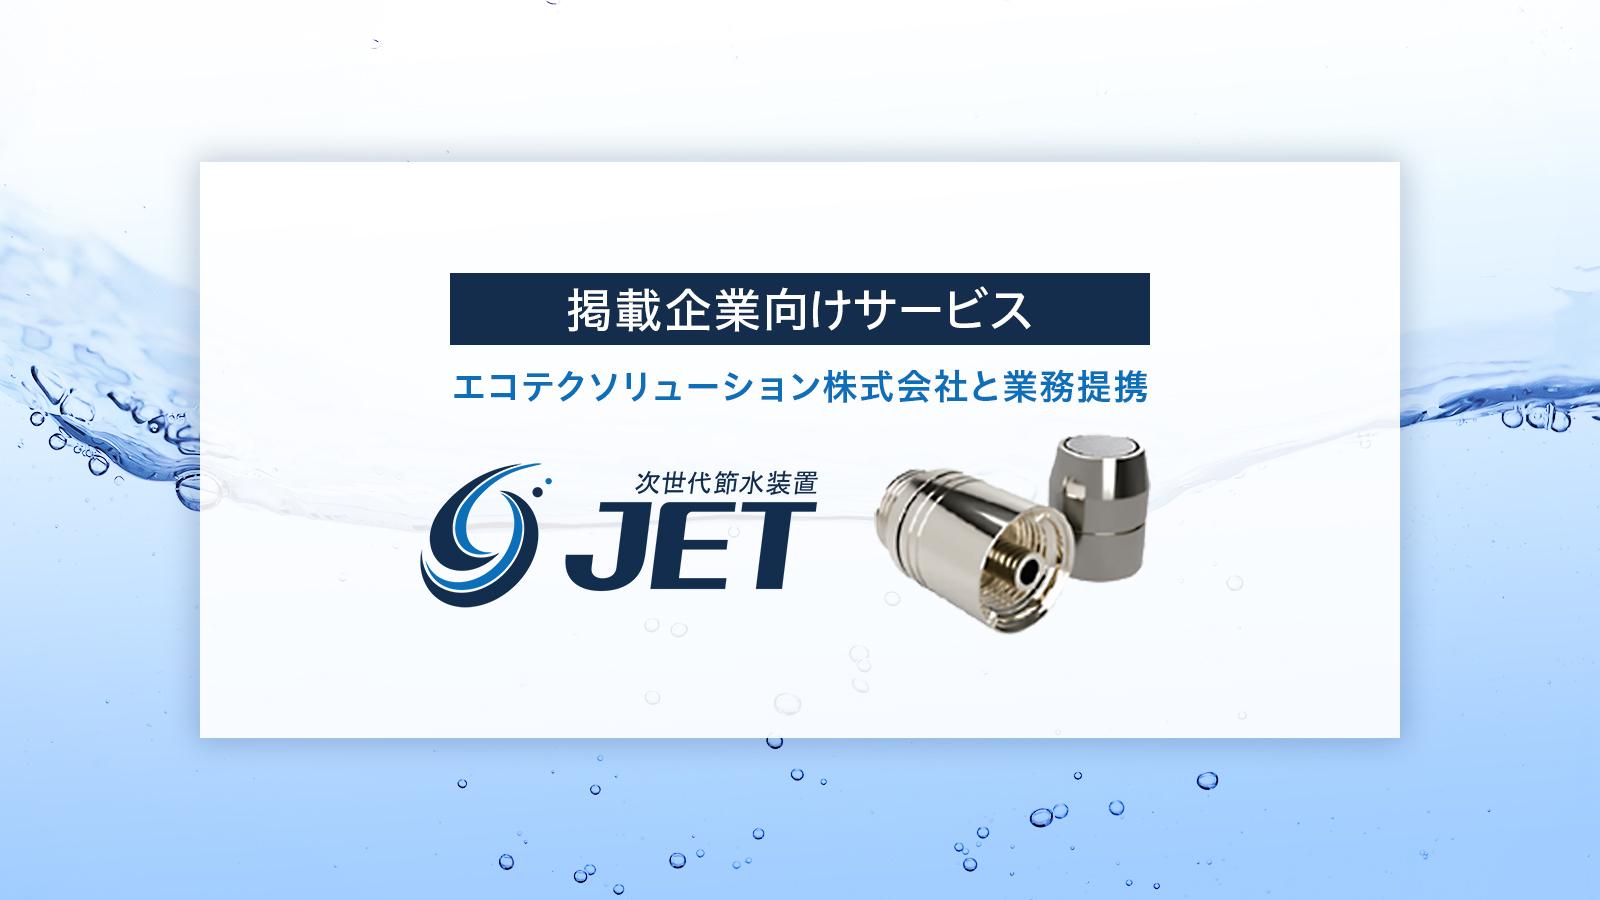 【PR】Weekly&Monthly株式会社、節水装置「JET」を提供するエコテクソリューション株式会社と提携開始!導入により水道光熱費の削減が可能に。